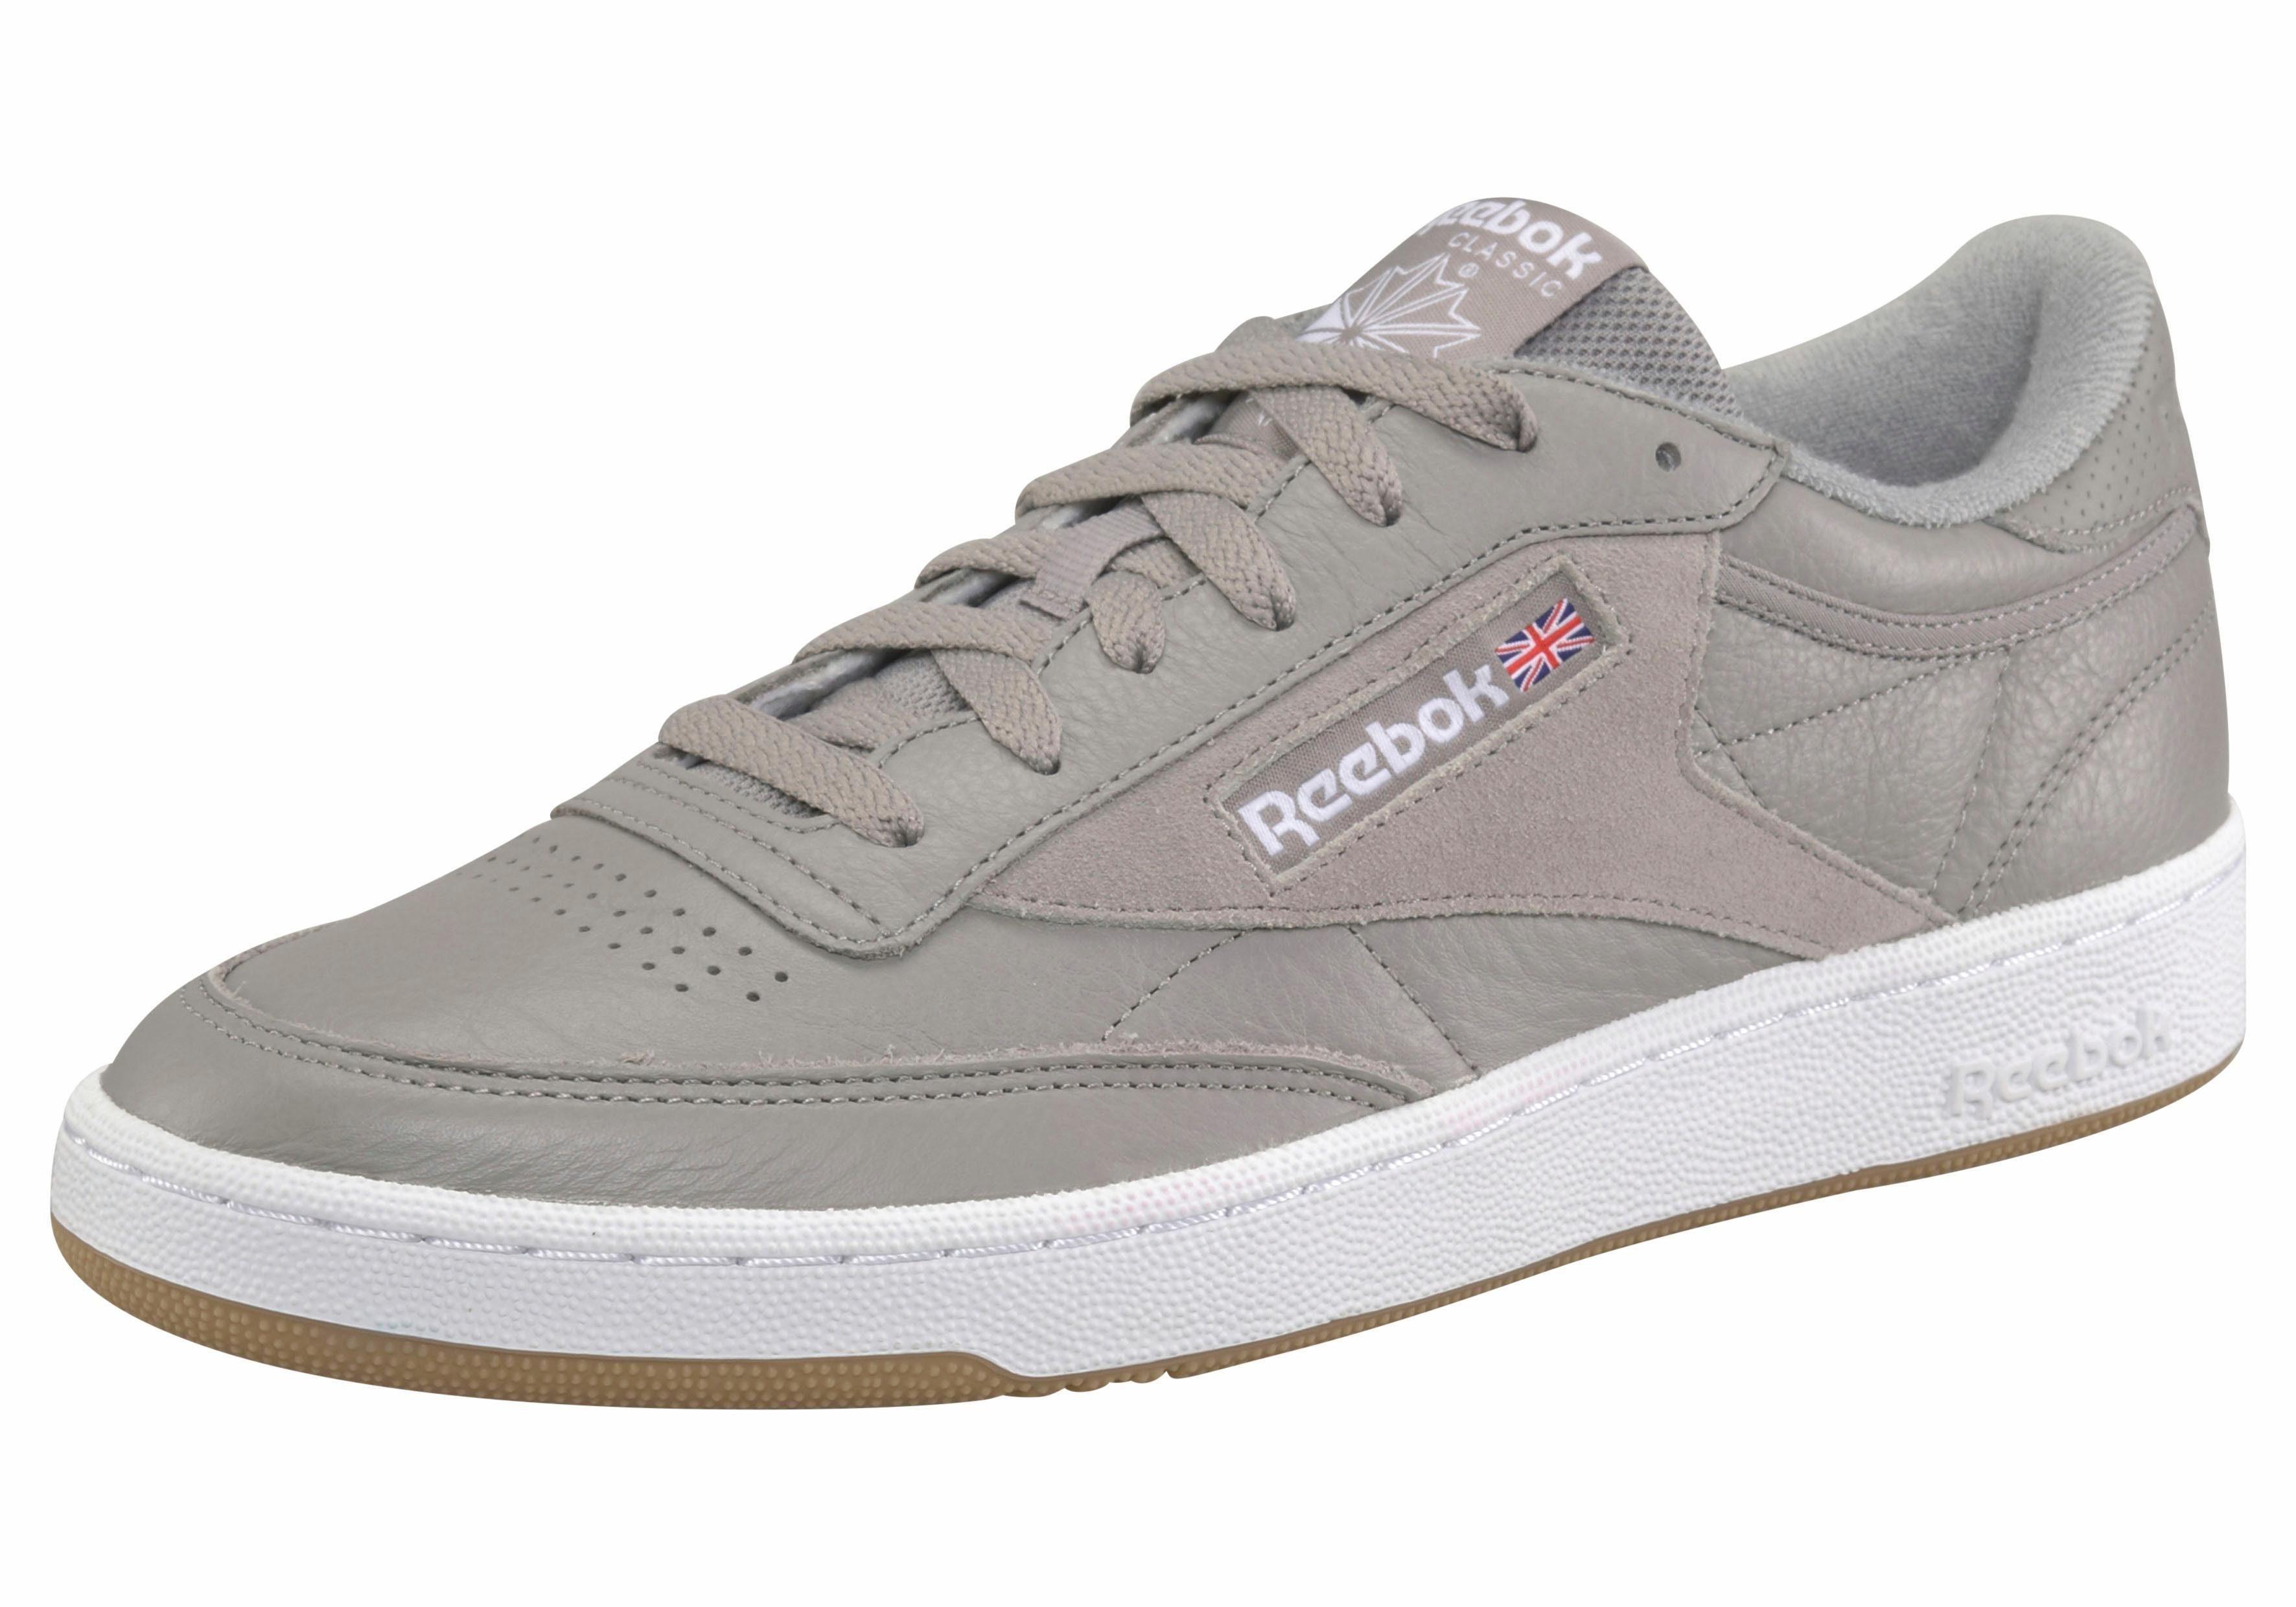 Reebok Club 85 C Chaussures Estl Gris 2YsTSb